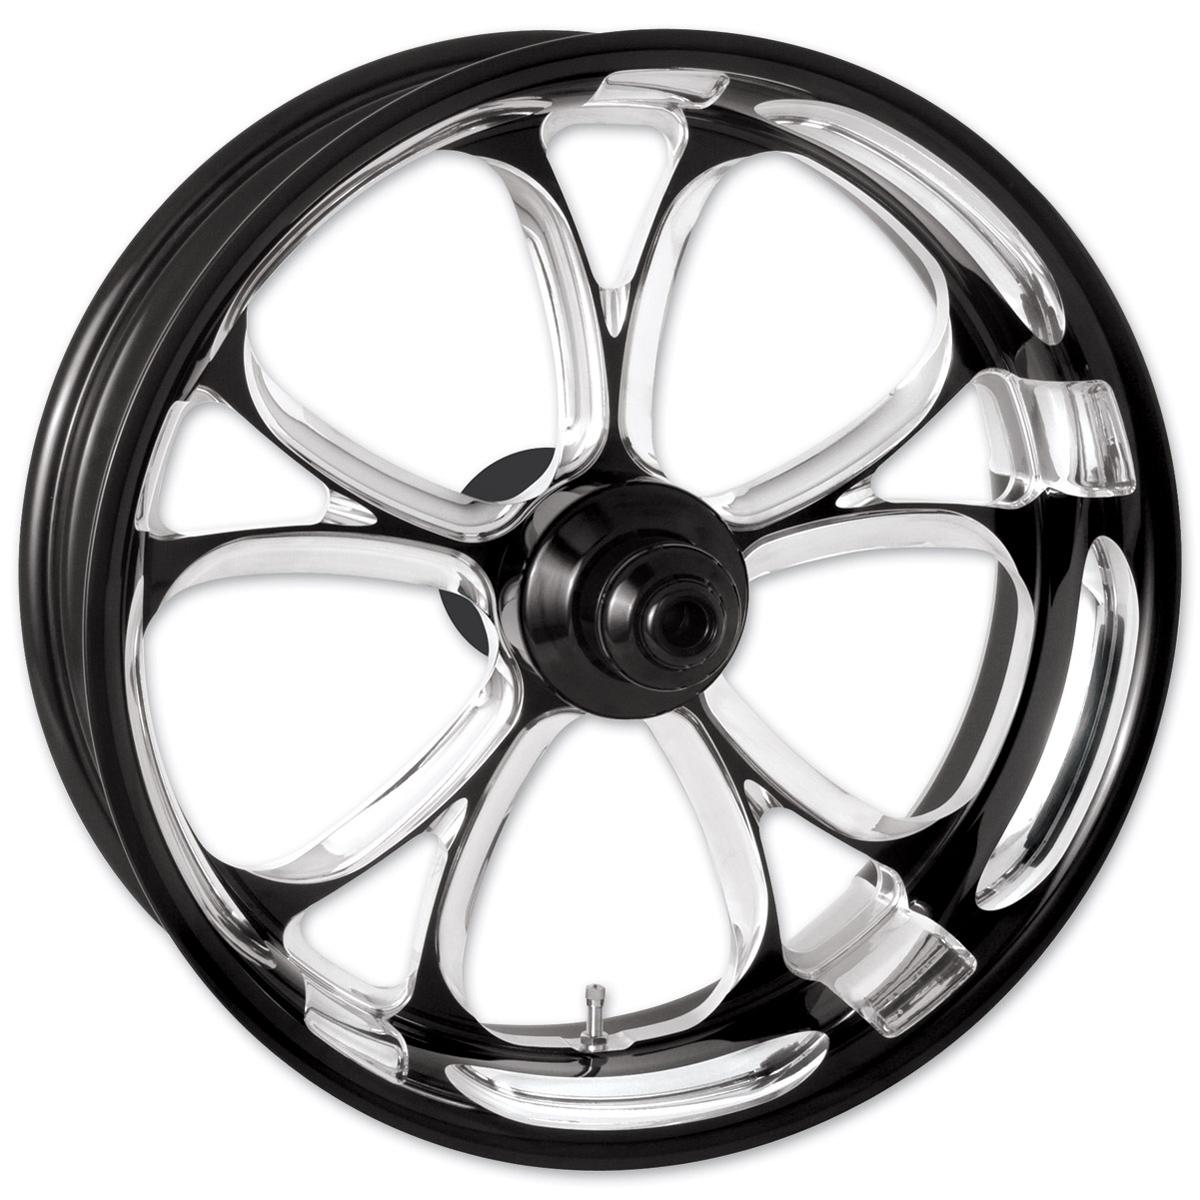 Performance Machine Luxe Platinum Cut Front Wheel 21x3.5 Non-ABS